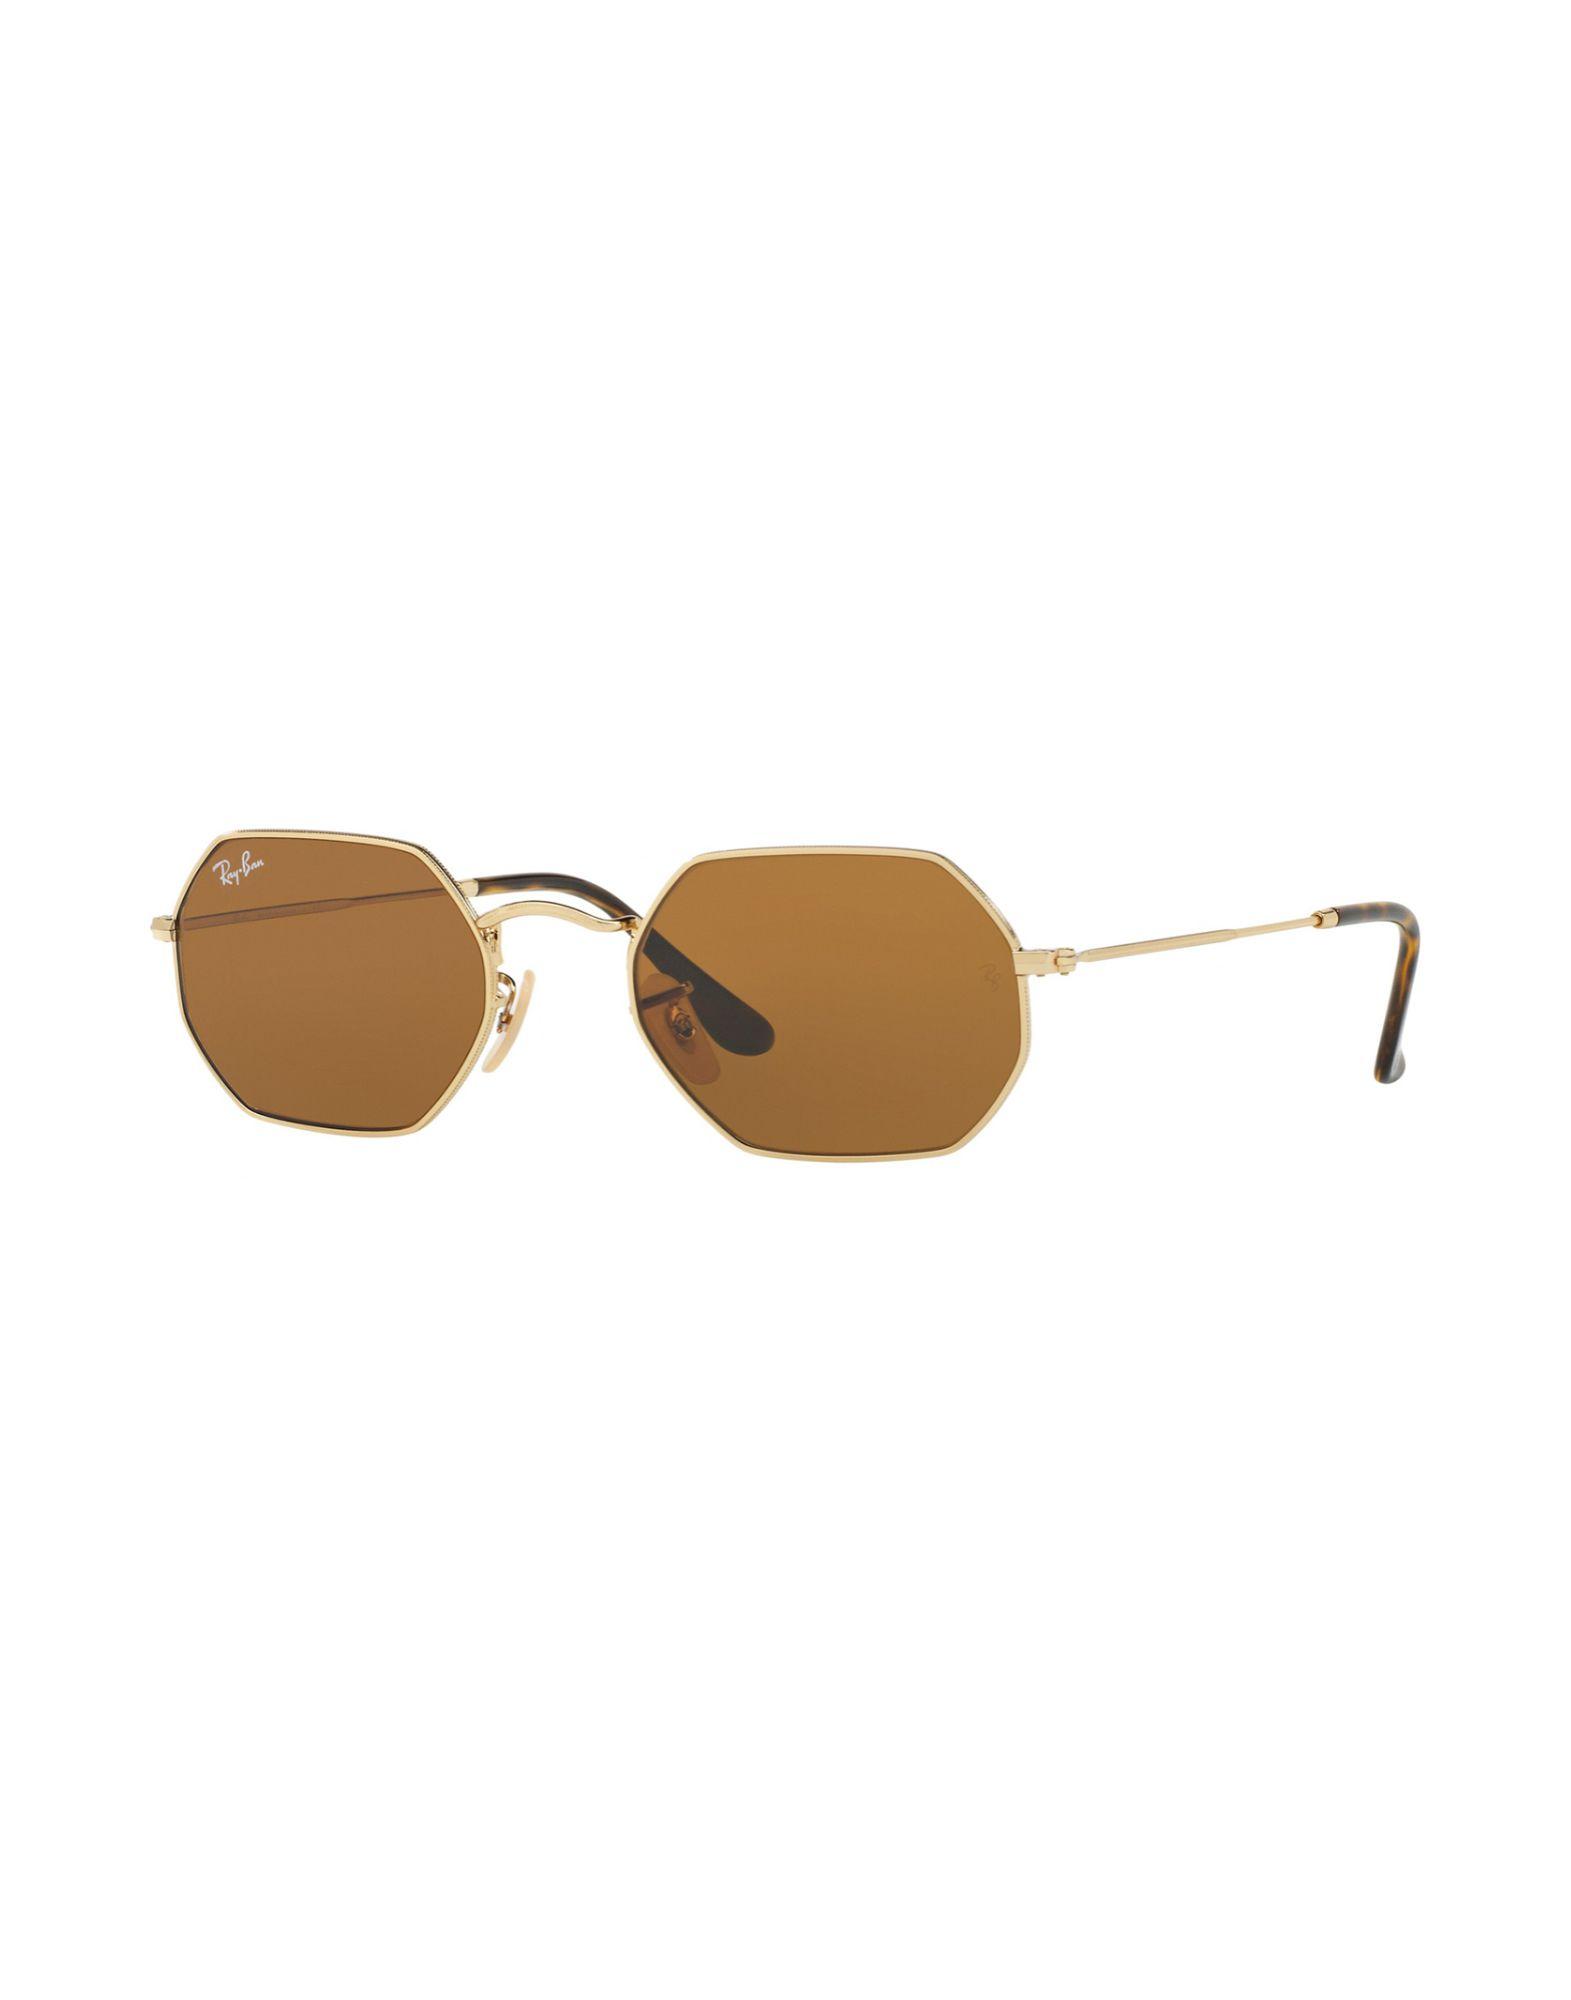 RAY-BAN Солнечные очки ray ban солнечные очки